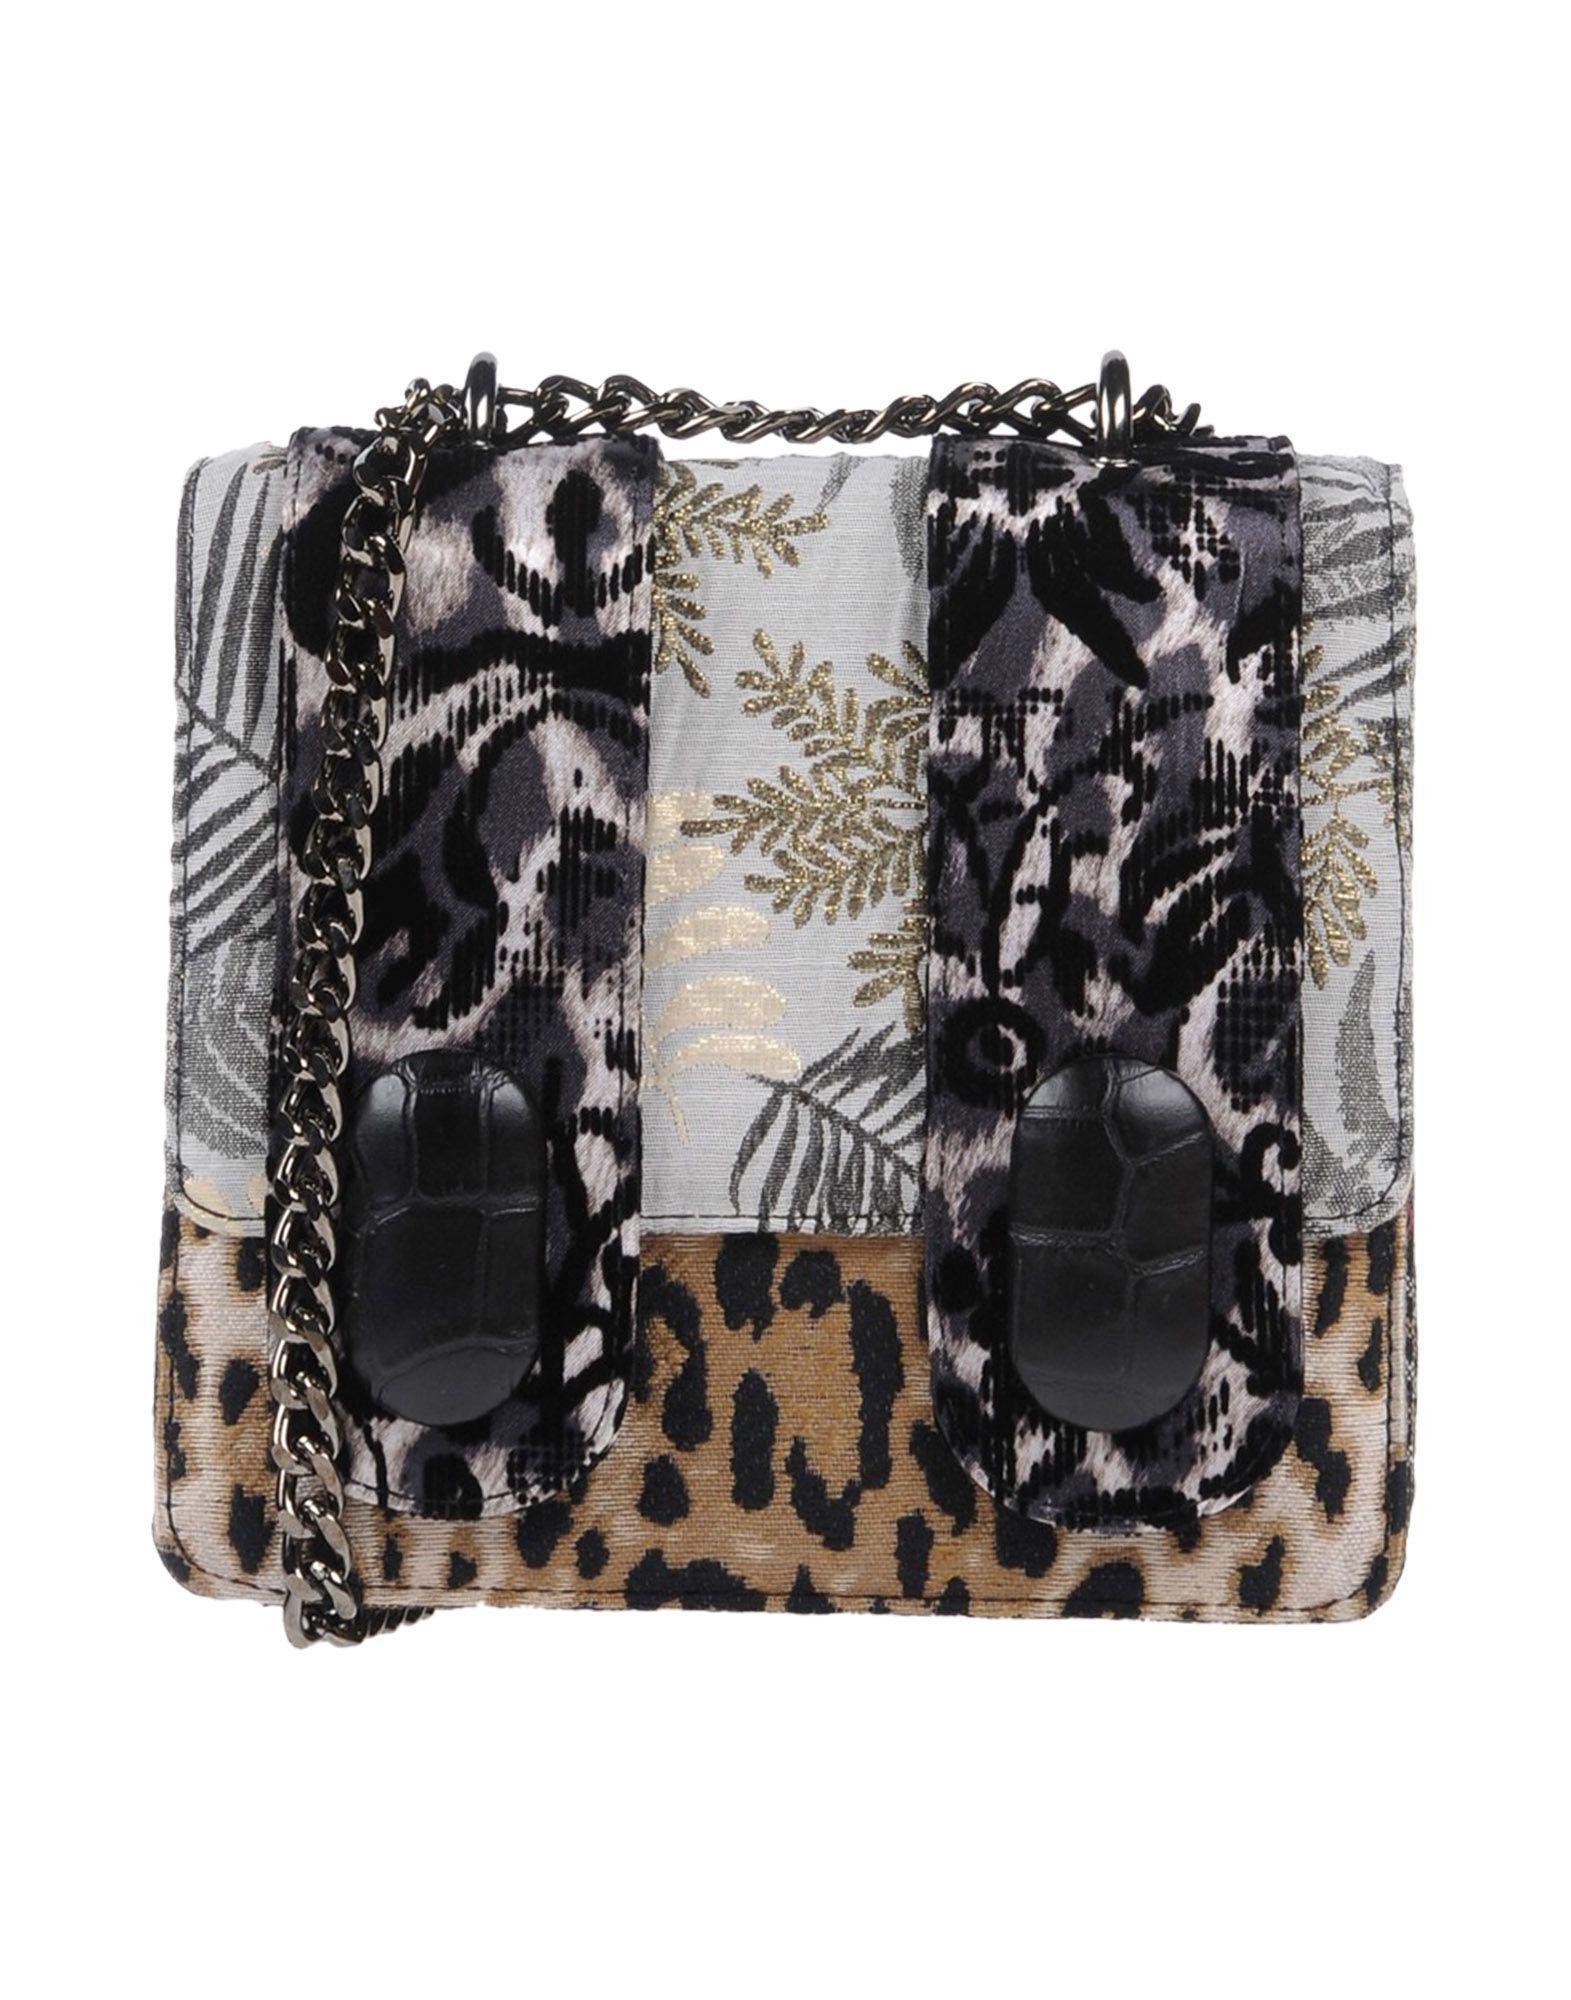 HANDBAGS - Cross-body bags Antonio Marras Huge Surprise Online Grey Outlet Store Online Multi Coloured Sale Pick A Best Outlet Best Prices xrd279r